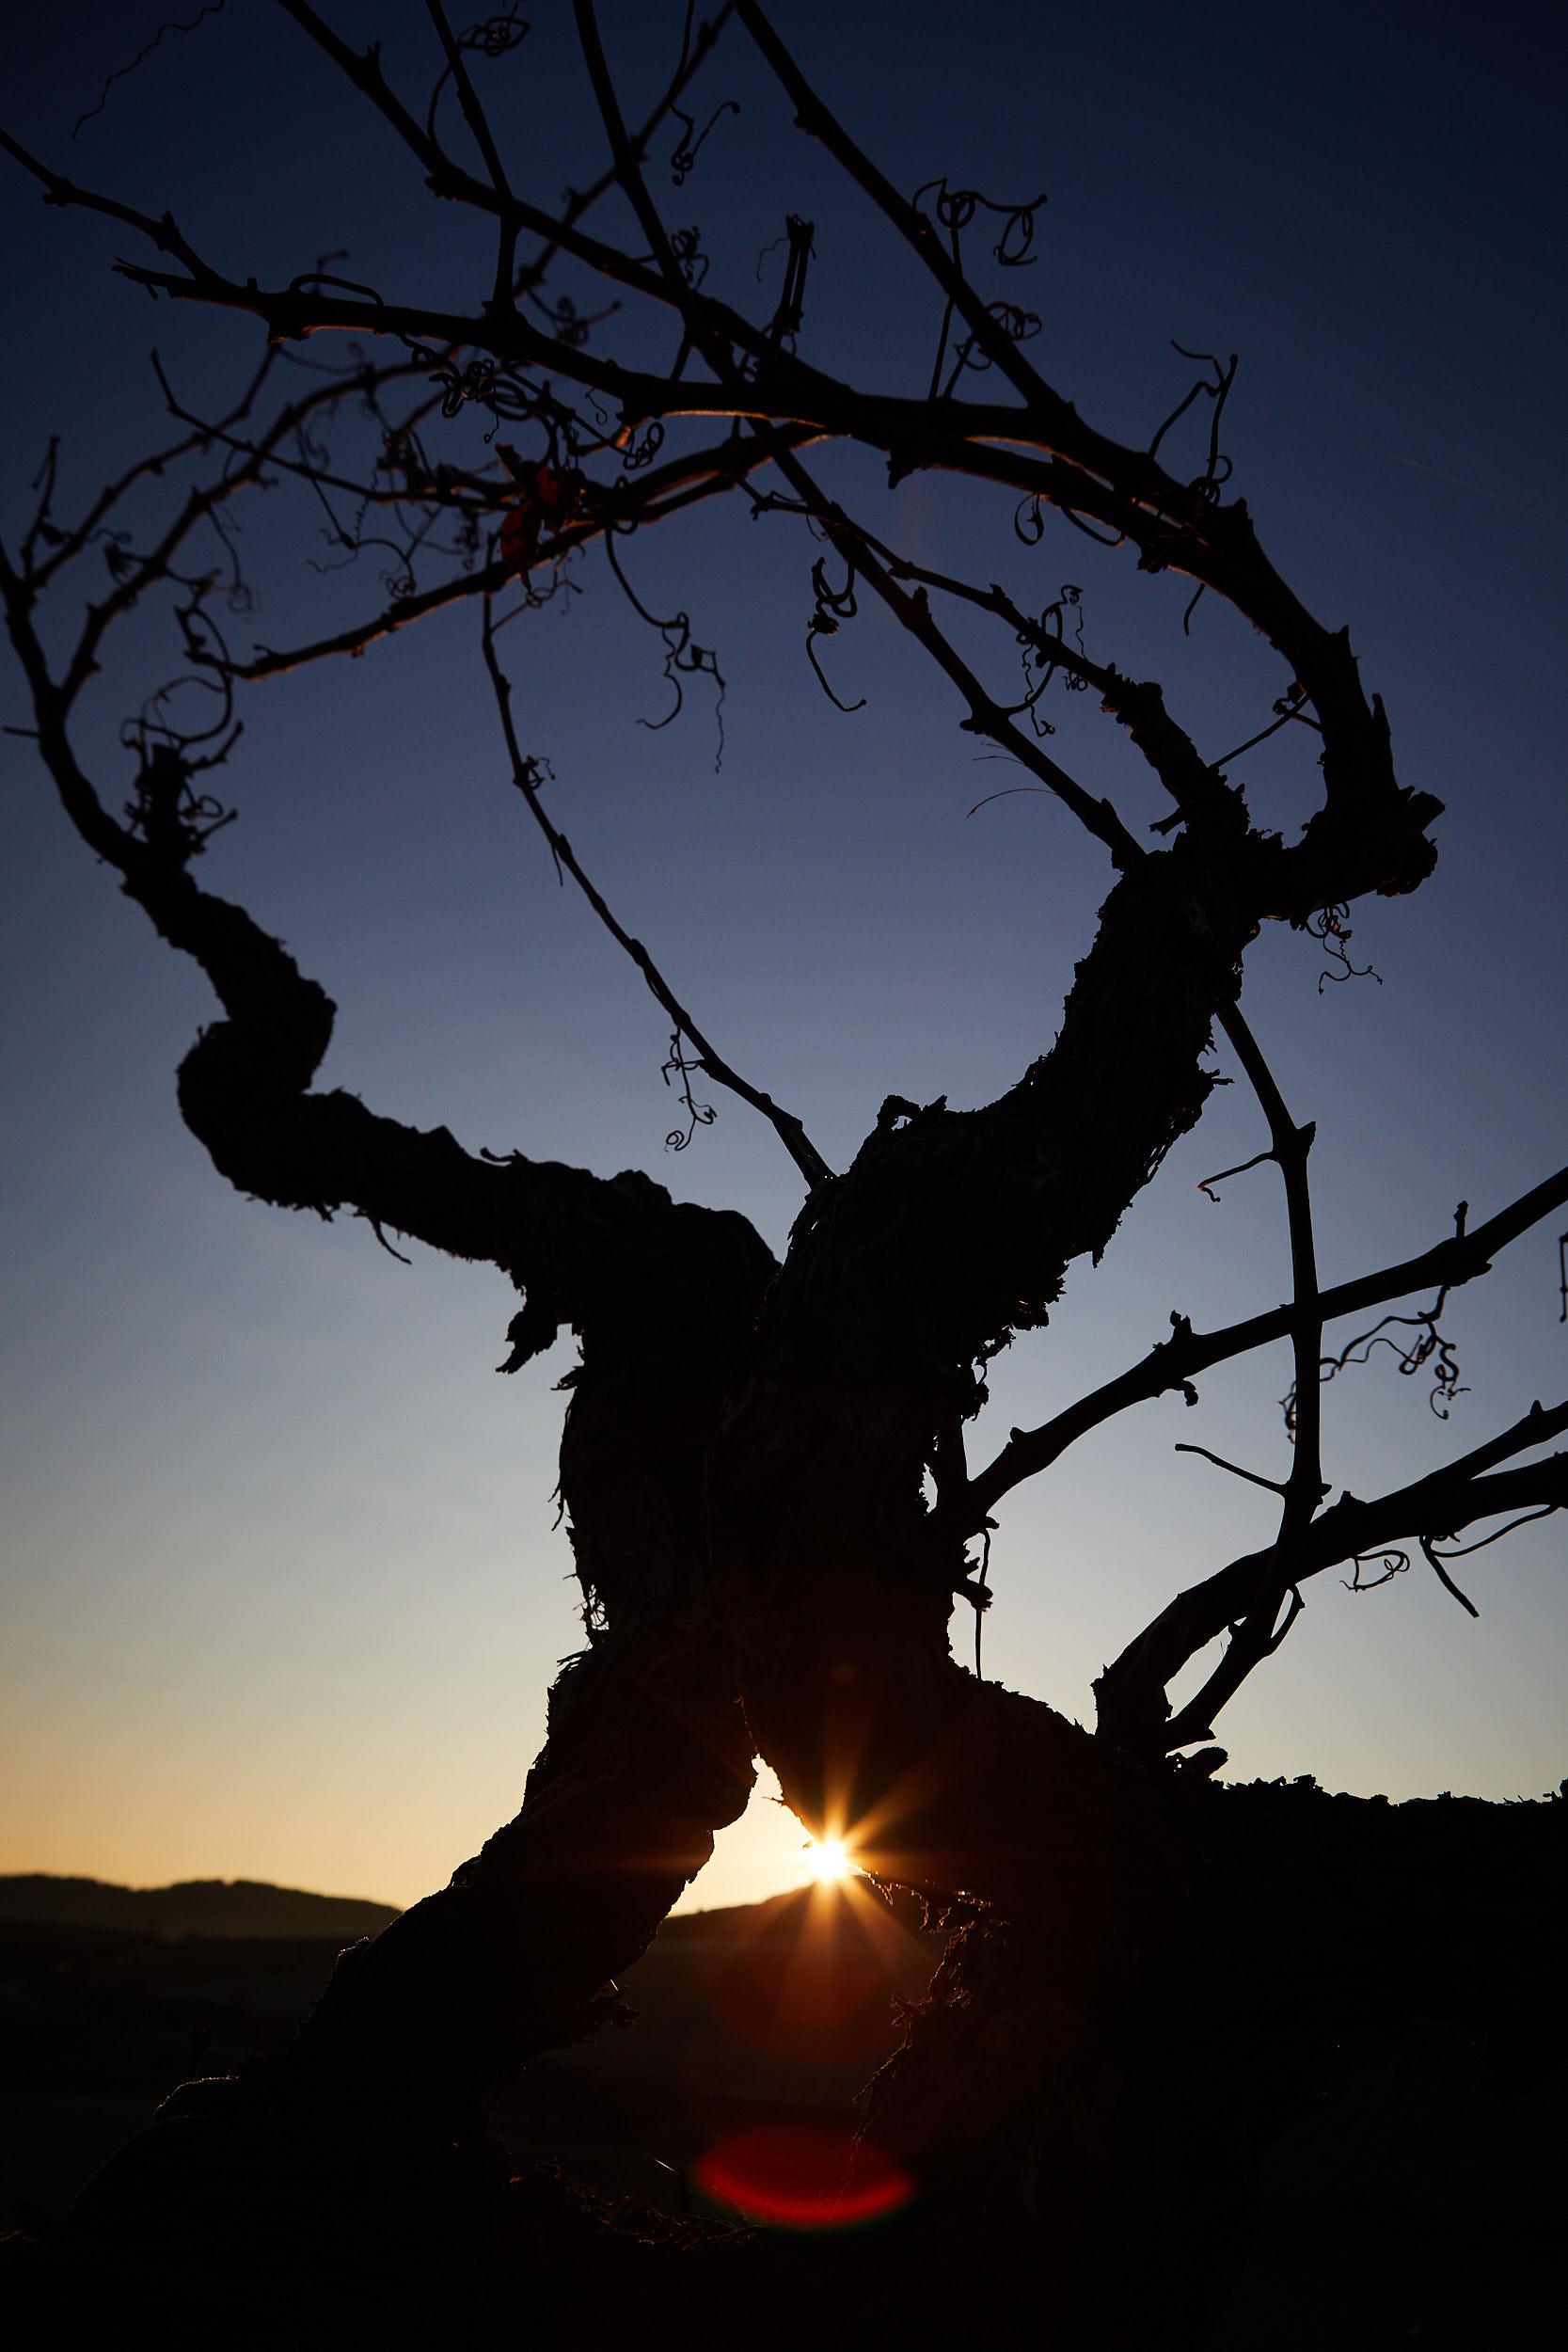 1801Commercial-professional-wine-photography-la-rioja-spain-James-Sturcke_0005.jpg